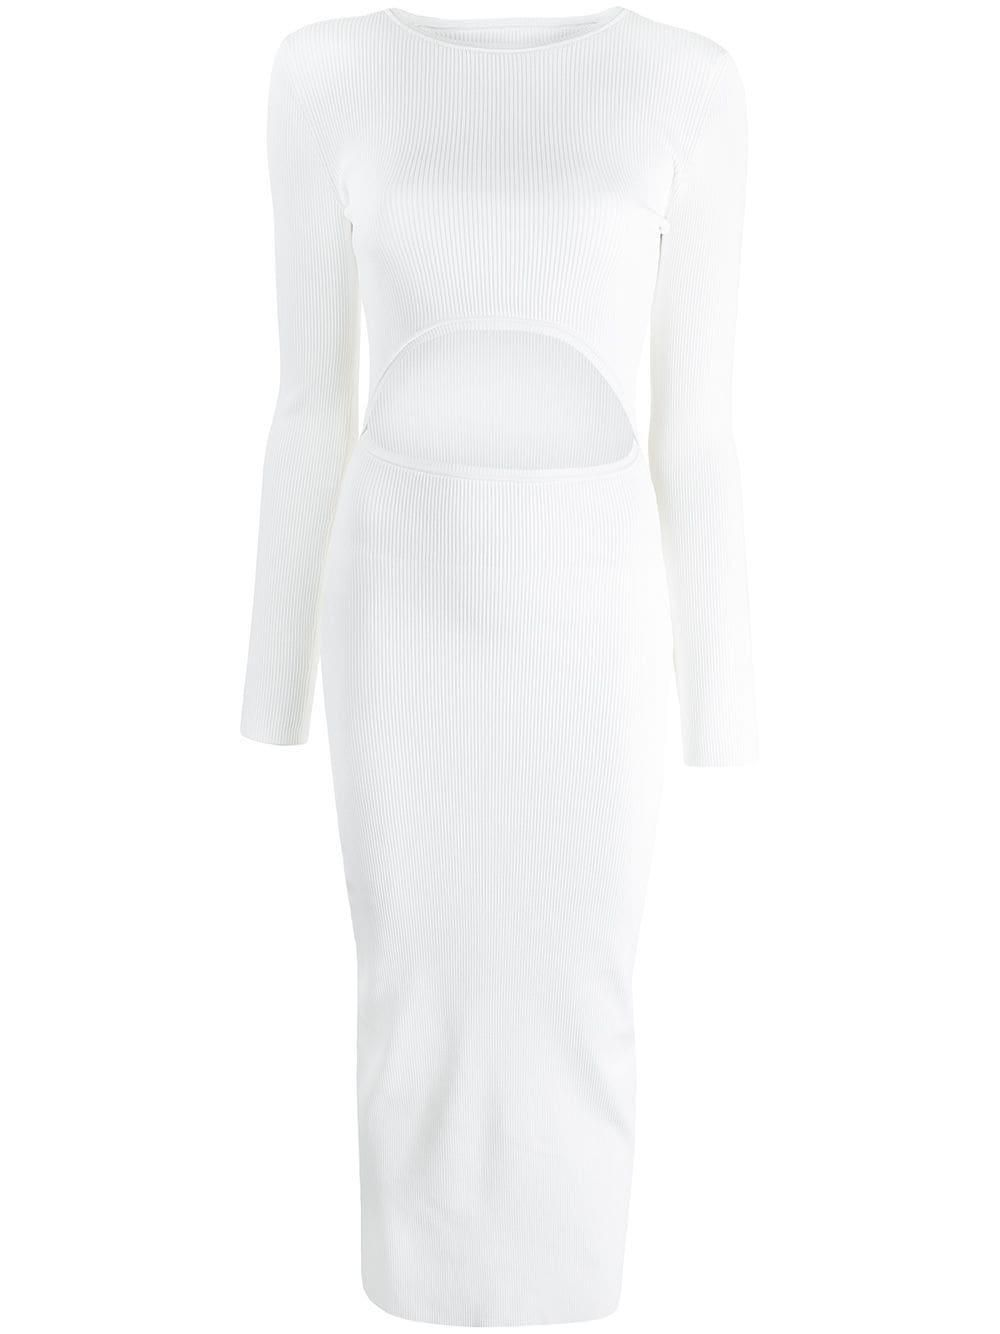 sir reversible cut out dress